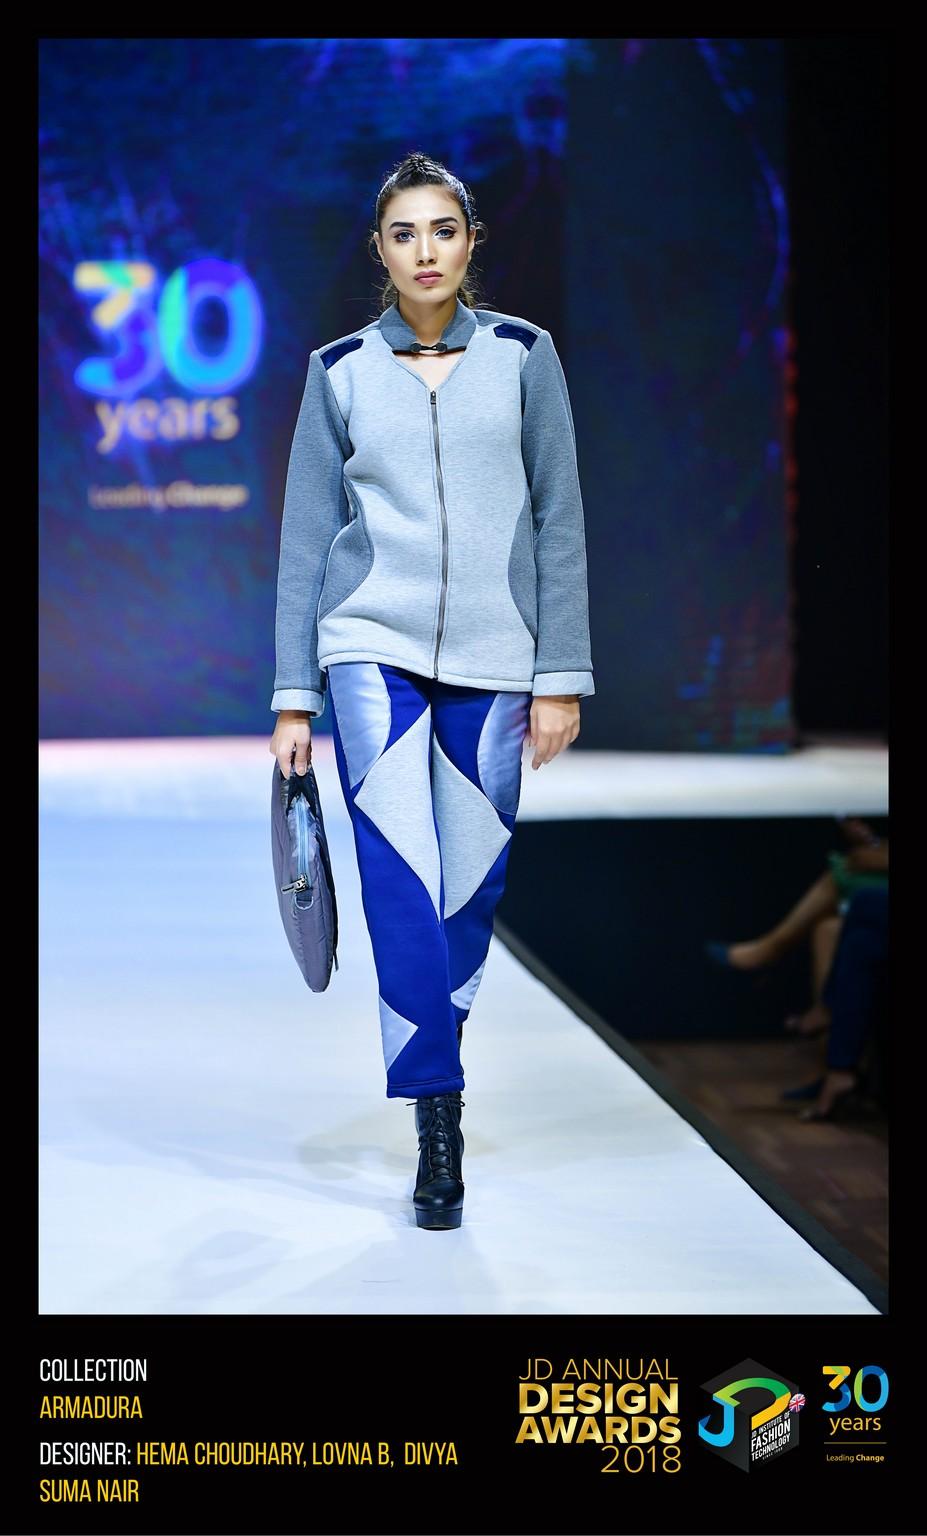 Armadura Collection – Change – JD Annual Design Awards 2018   Designer: Hema, Lovna, Divya   Photography : Jerin Nath (@jerin_nath) armadura collection - ARMADURA5 - Armadura Collection – Change – JD Annual Design Awards 2018